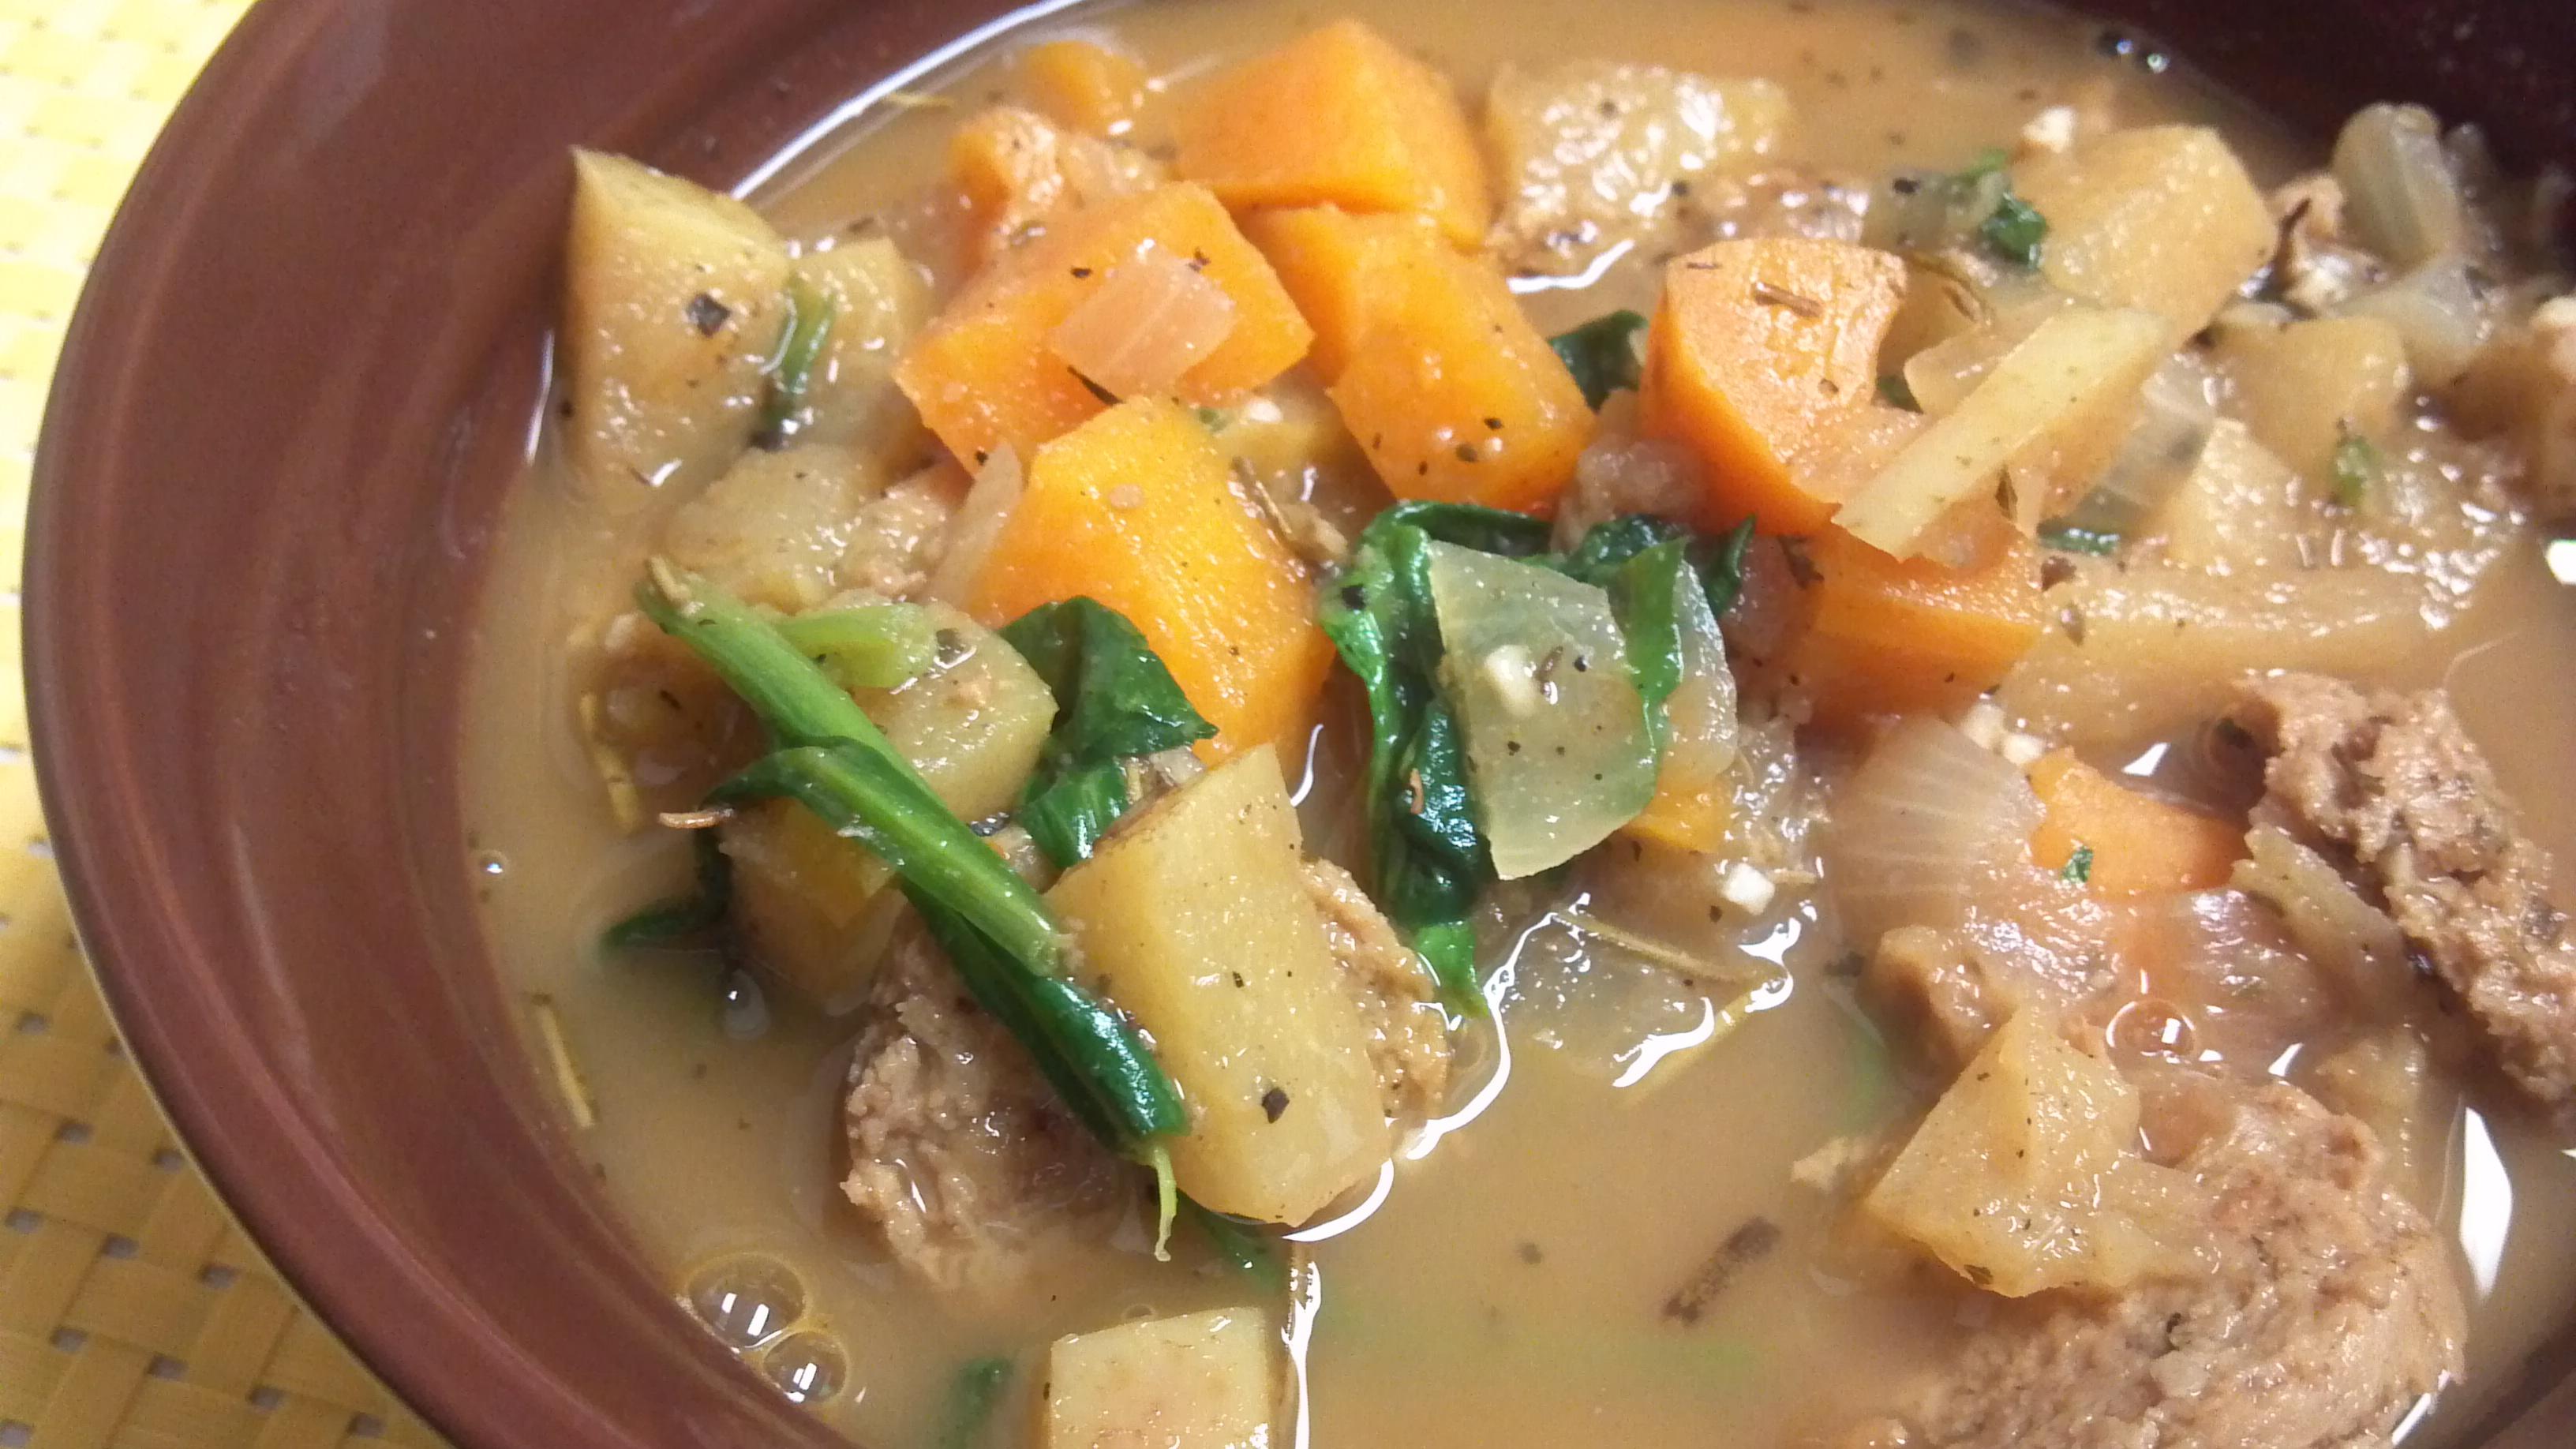 Sweet Potato And Sausage Soup Recipes — Dishmaps